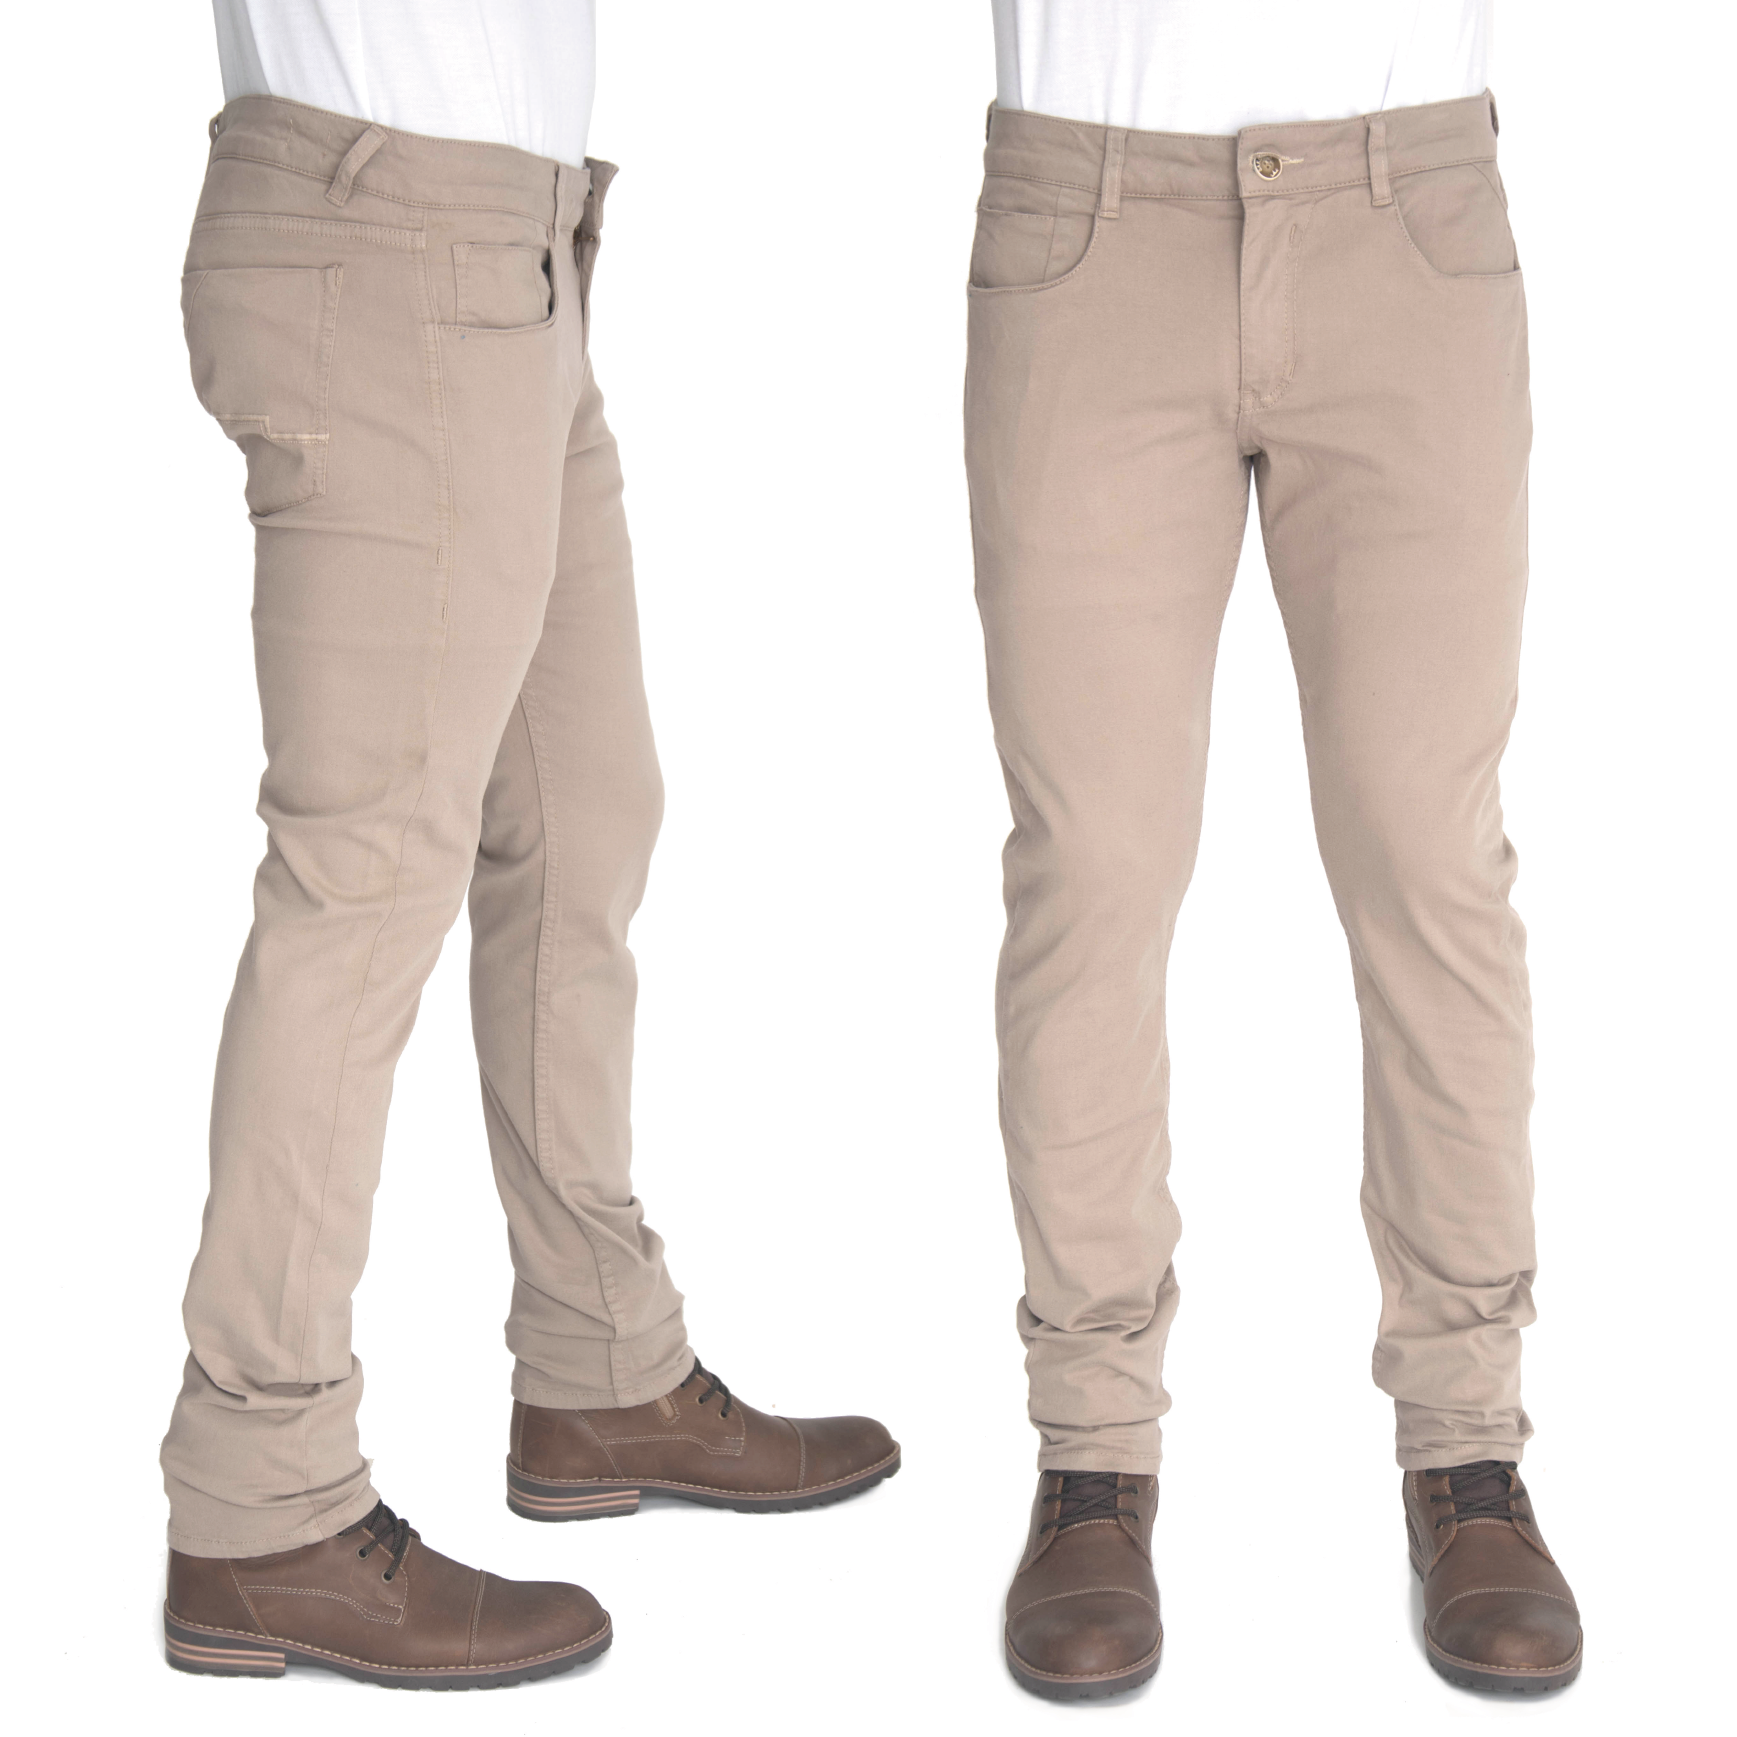 277d492b0bc52 Como combinar un par de pantalones kaki  una camisa manga larga azul oscura  y unos